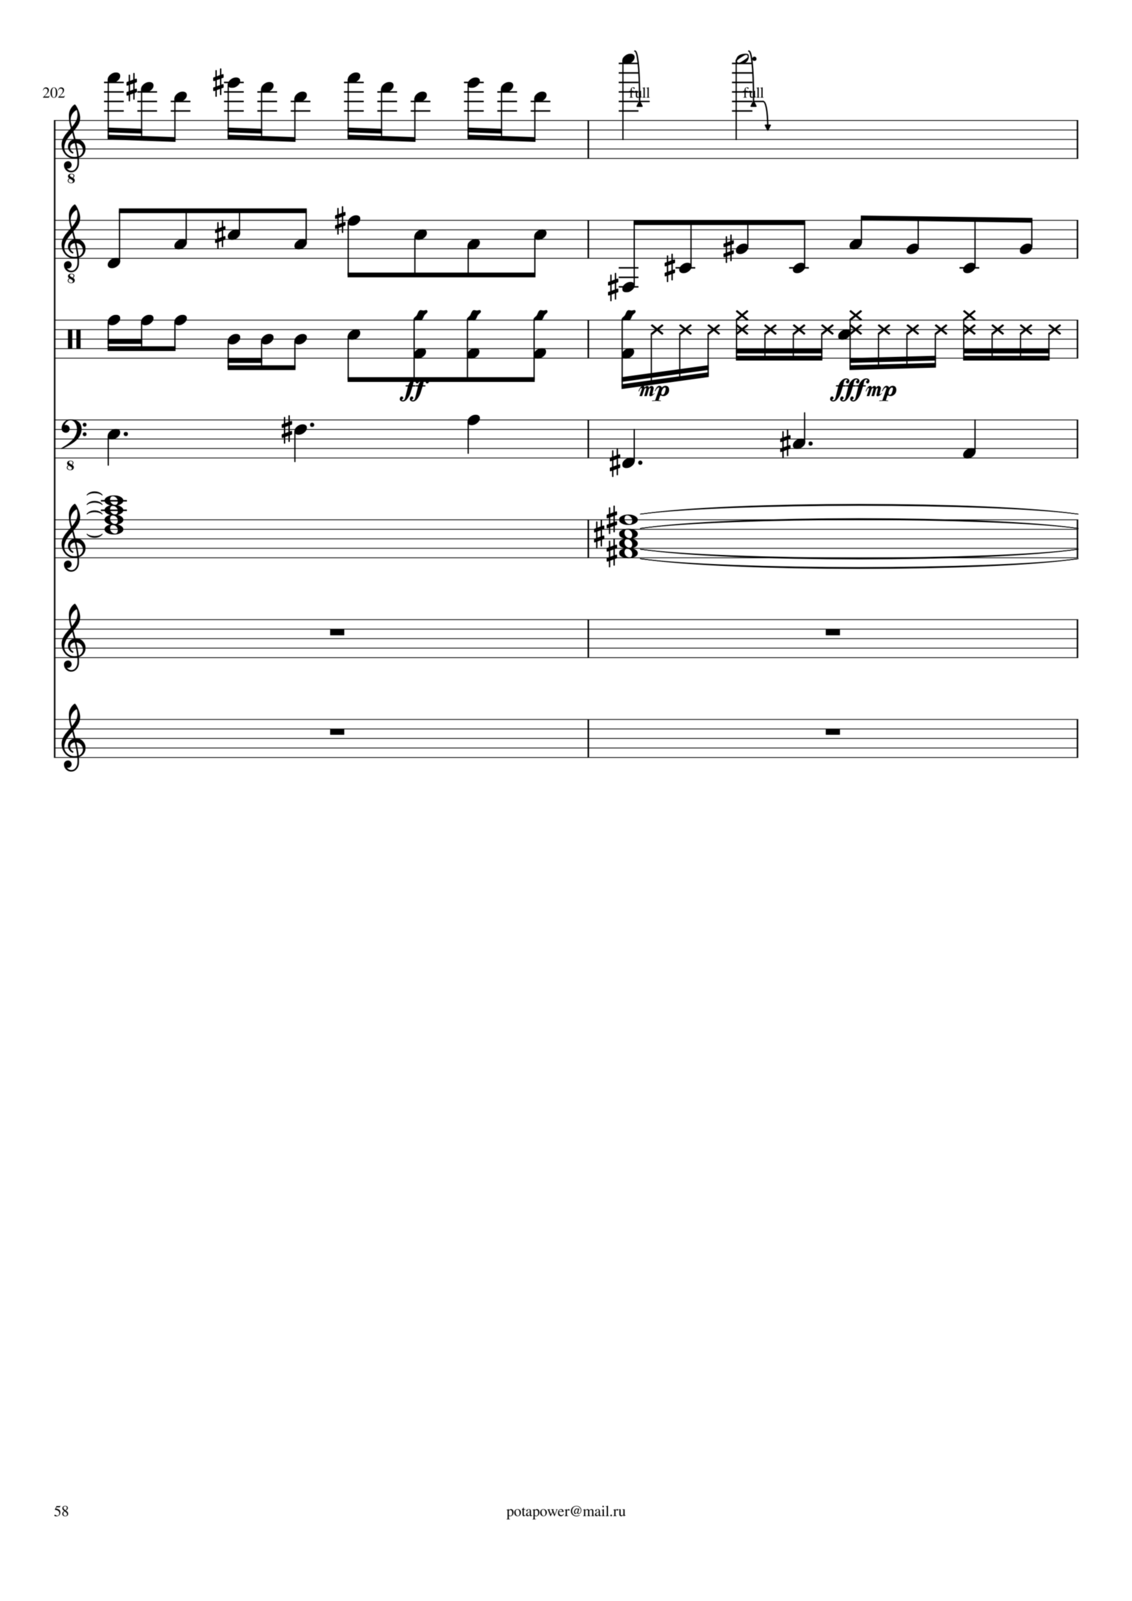 N.A.S.T.YA slide, Image 58